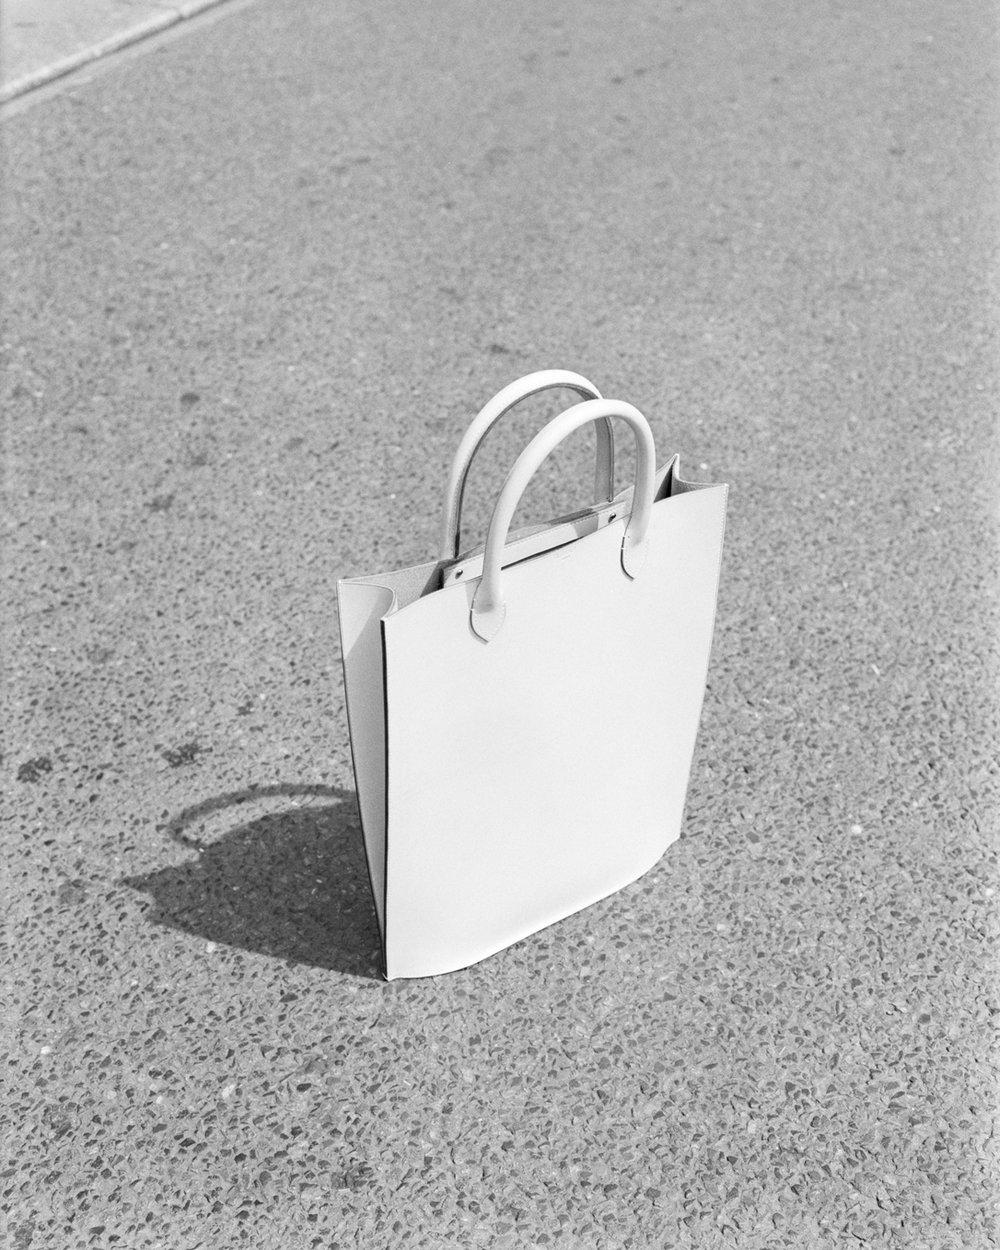 16- 15- ASWAD 1 Tote Bag N 2- Rcd.jpg